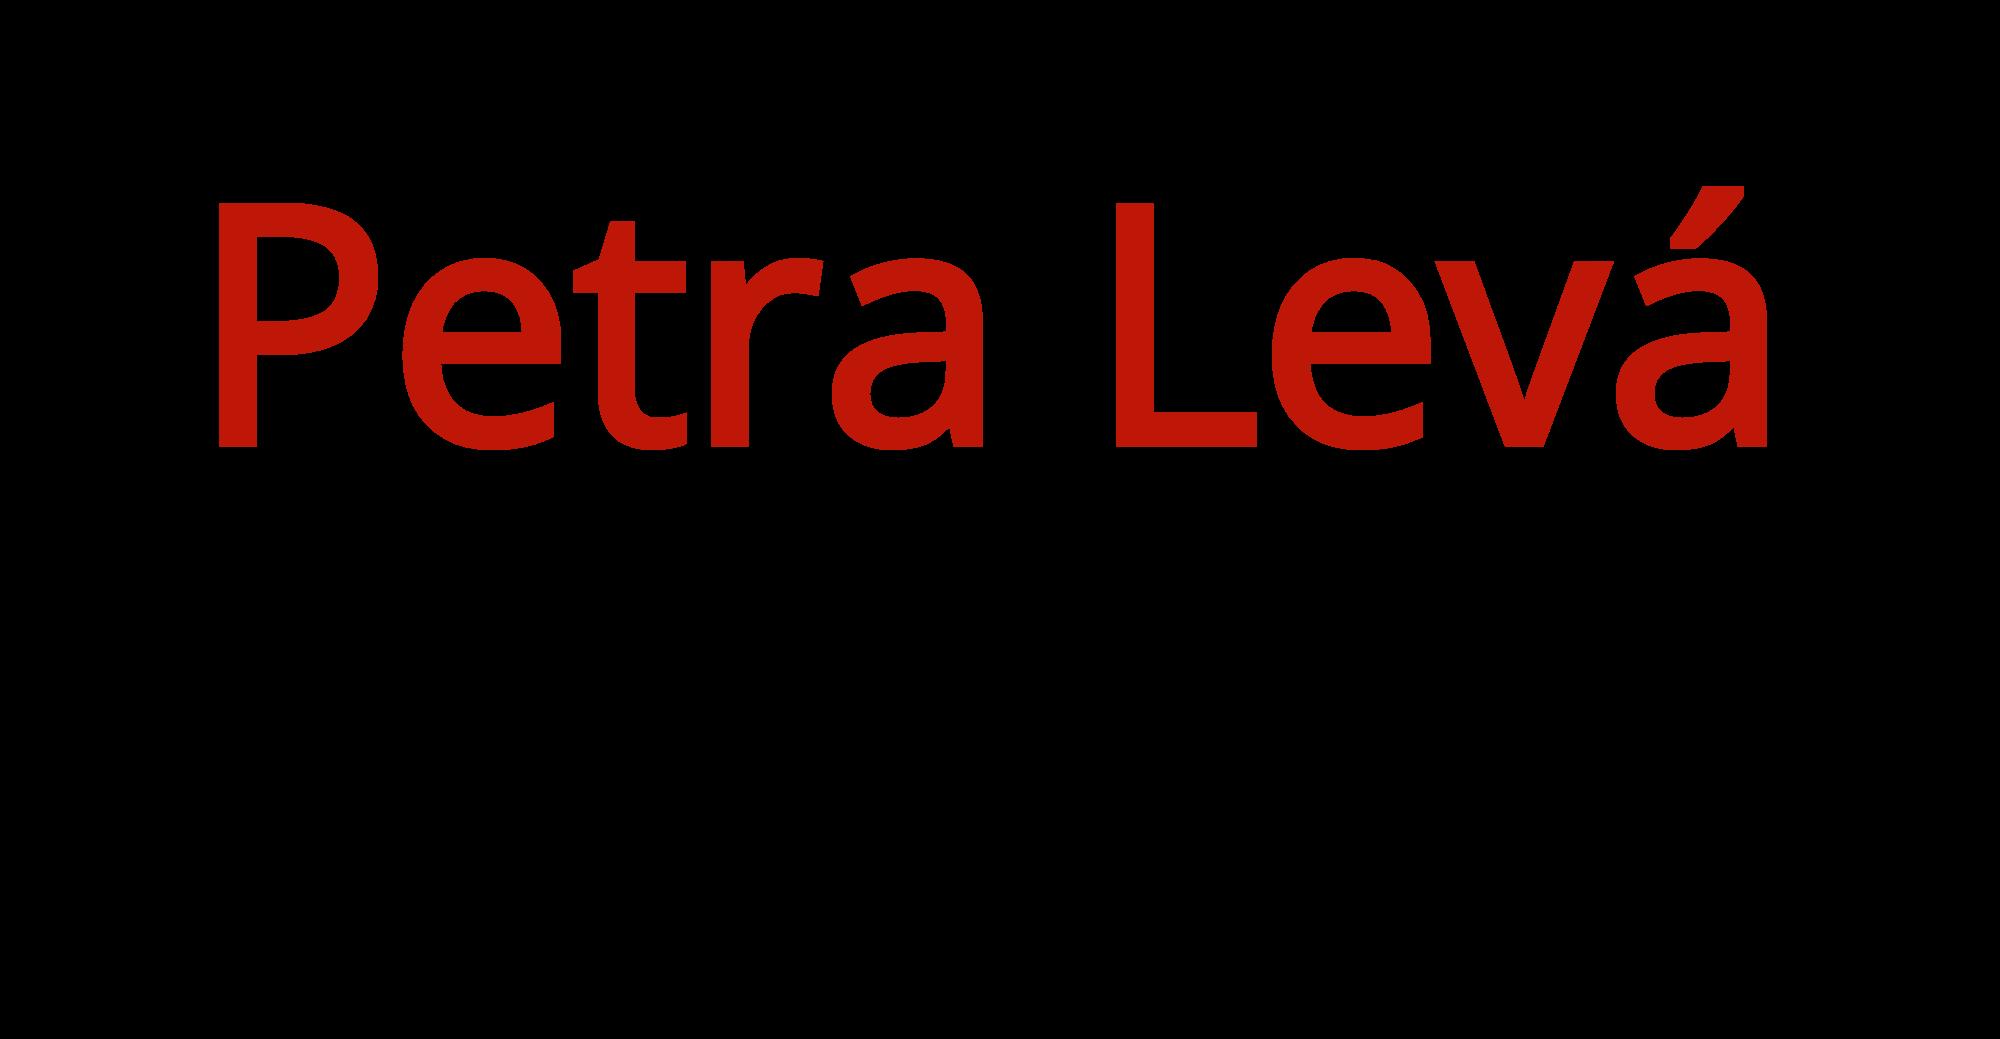 Petra Levá eshop